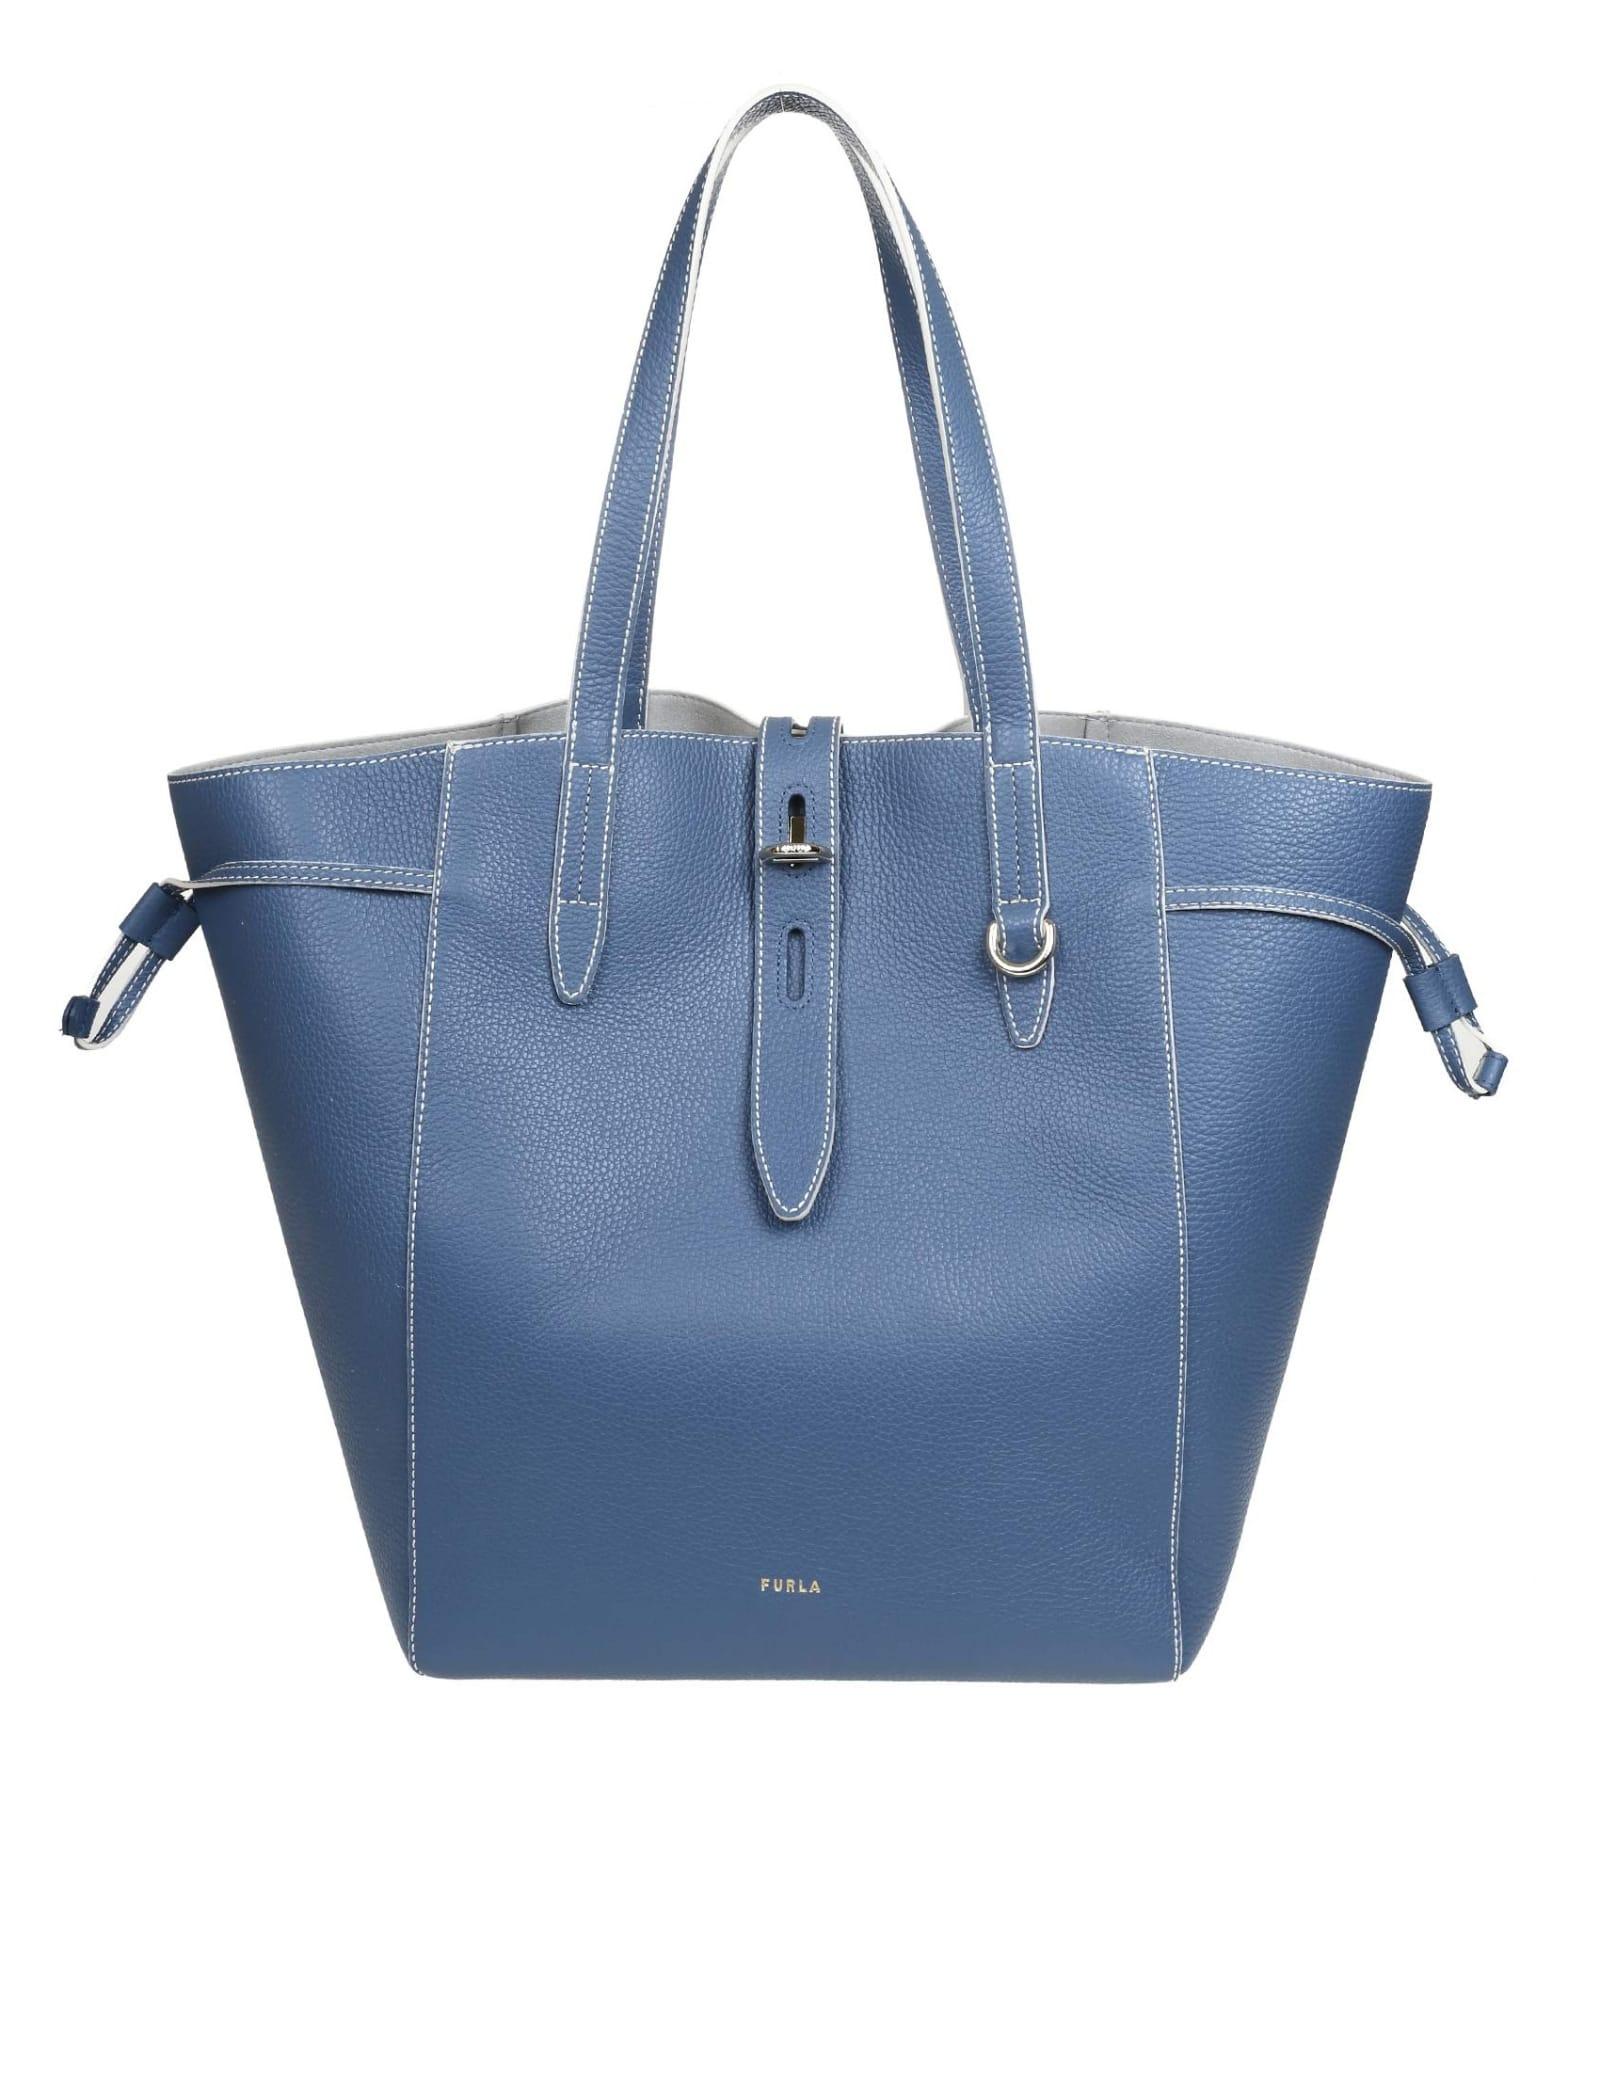 Furla Leathers SHOPPING NET BAG IN BLUE DENIM CALFSKIN